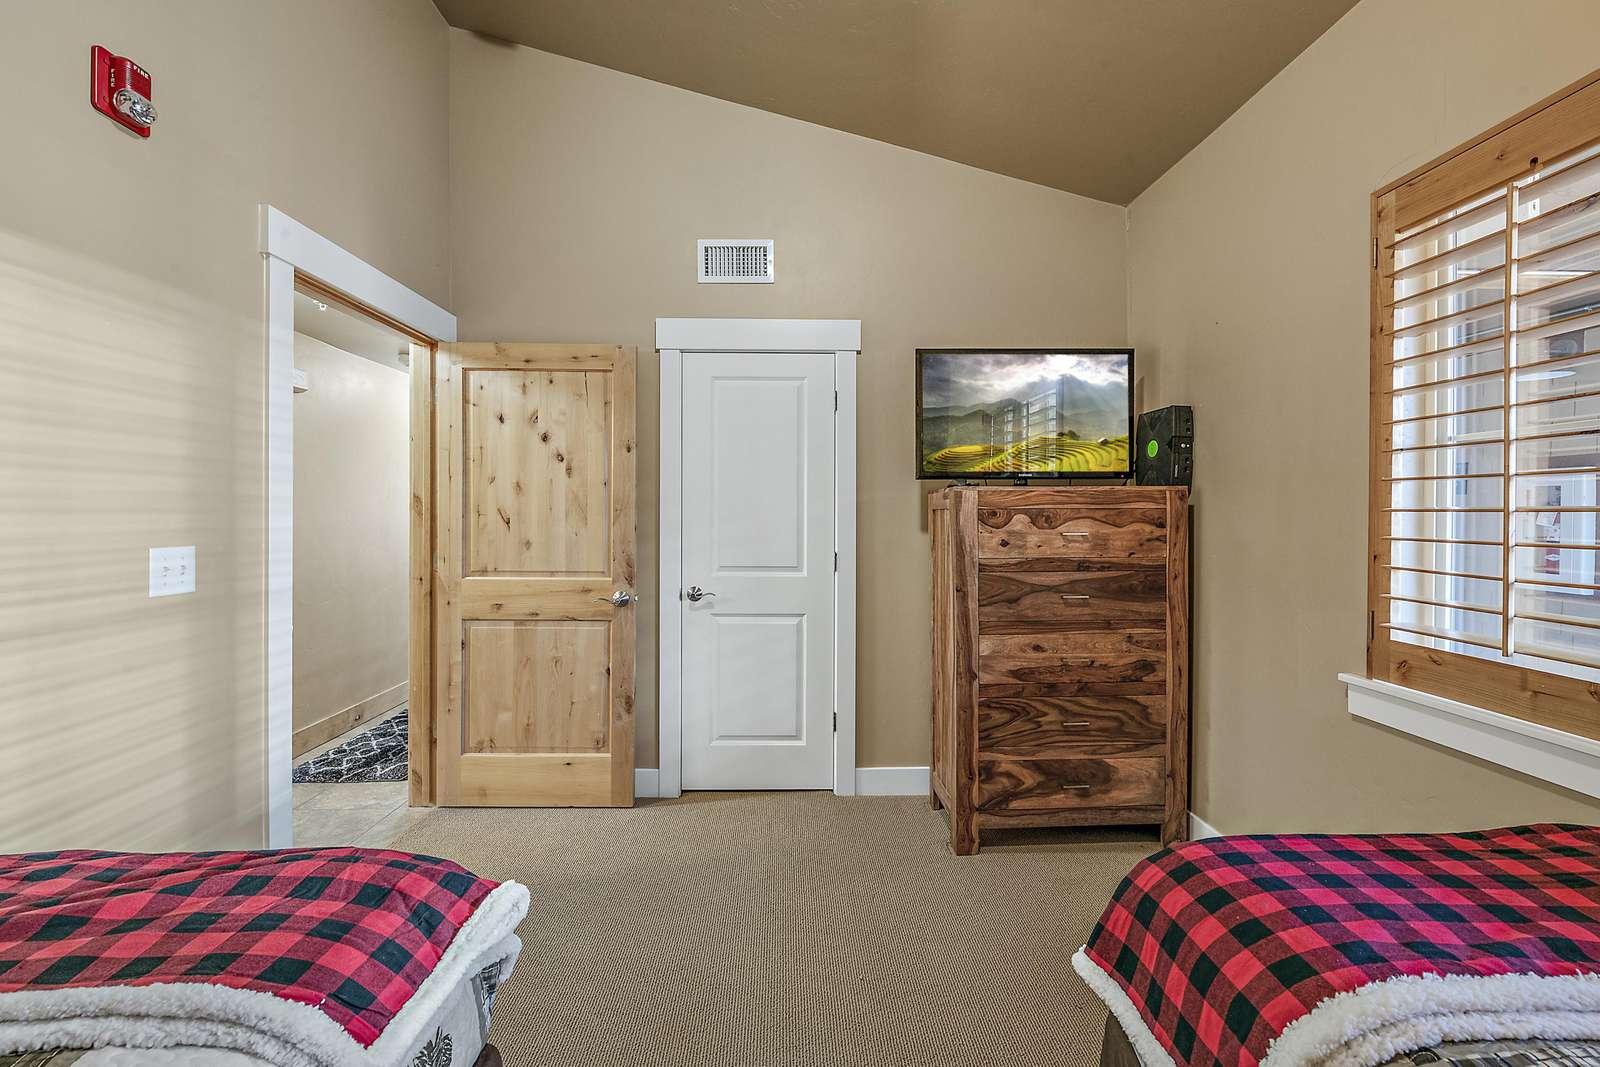 Closet space with dresser